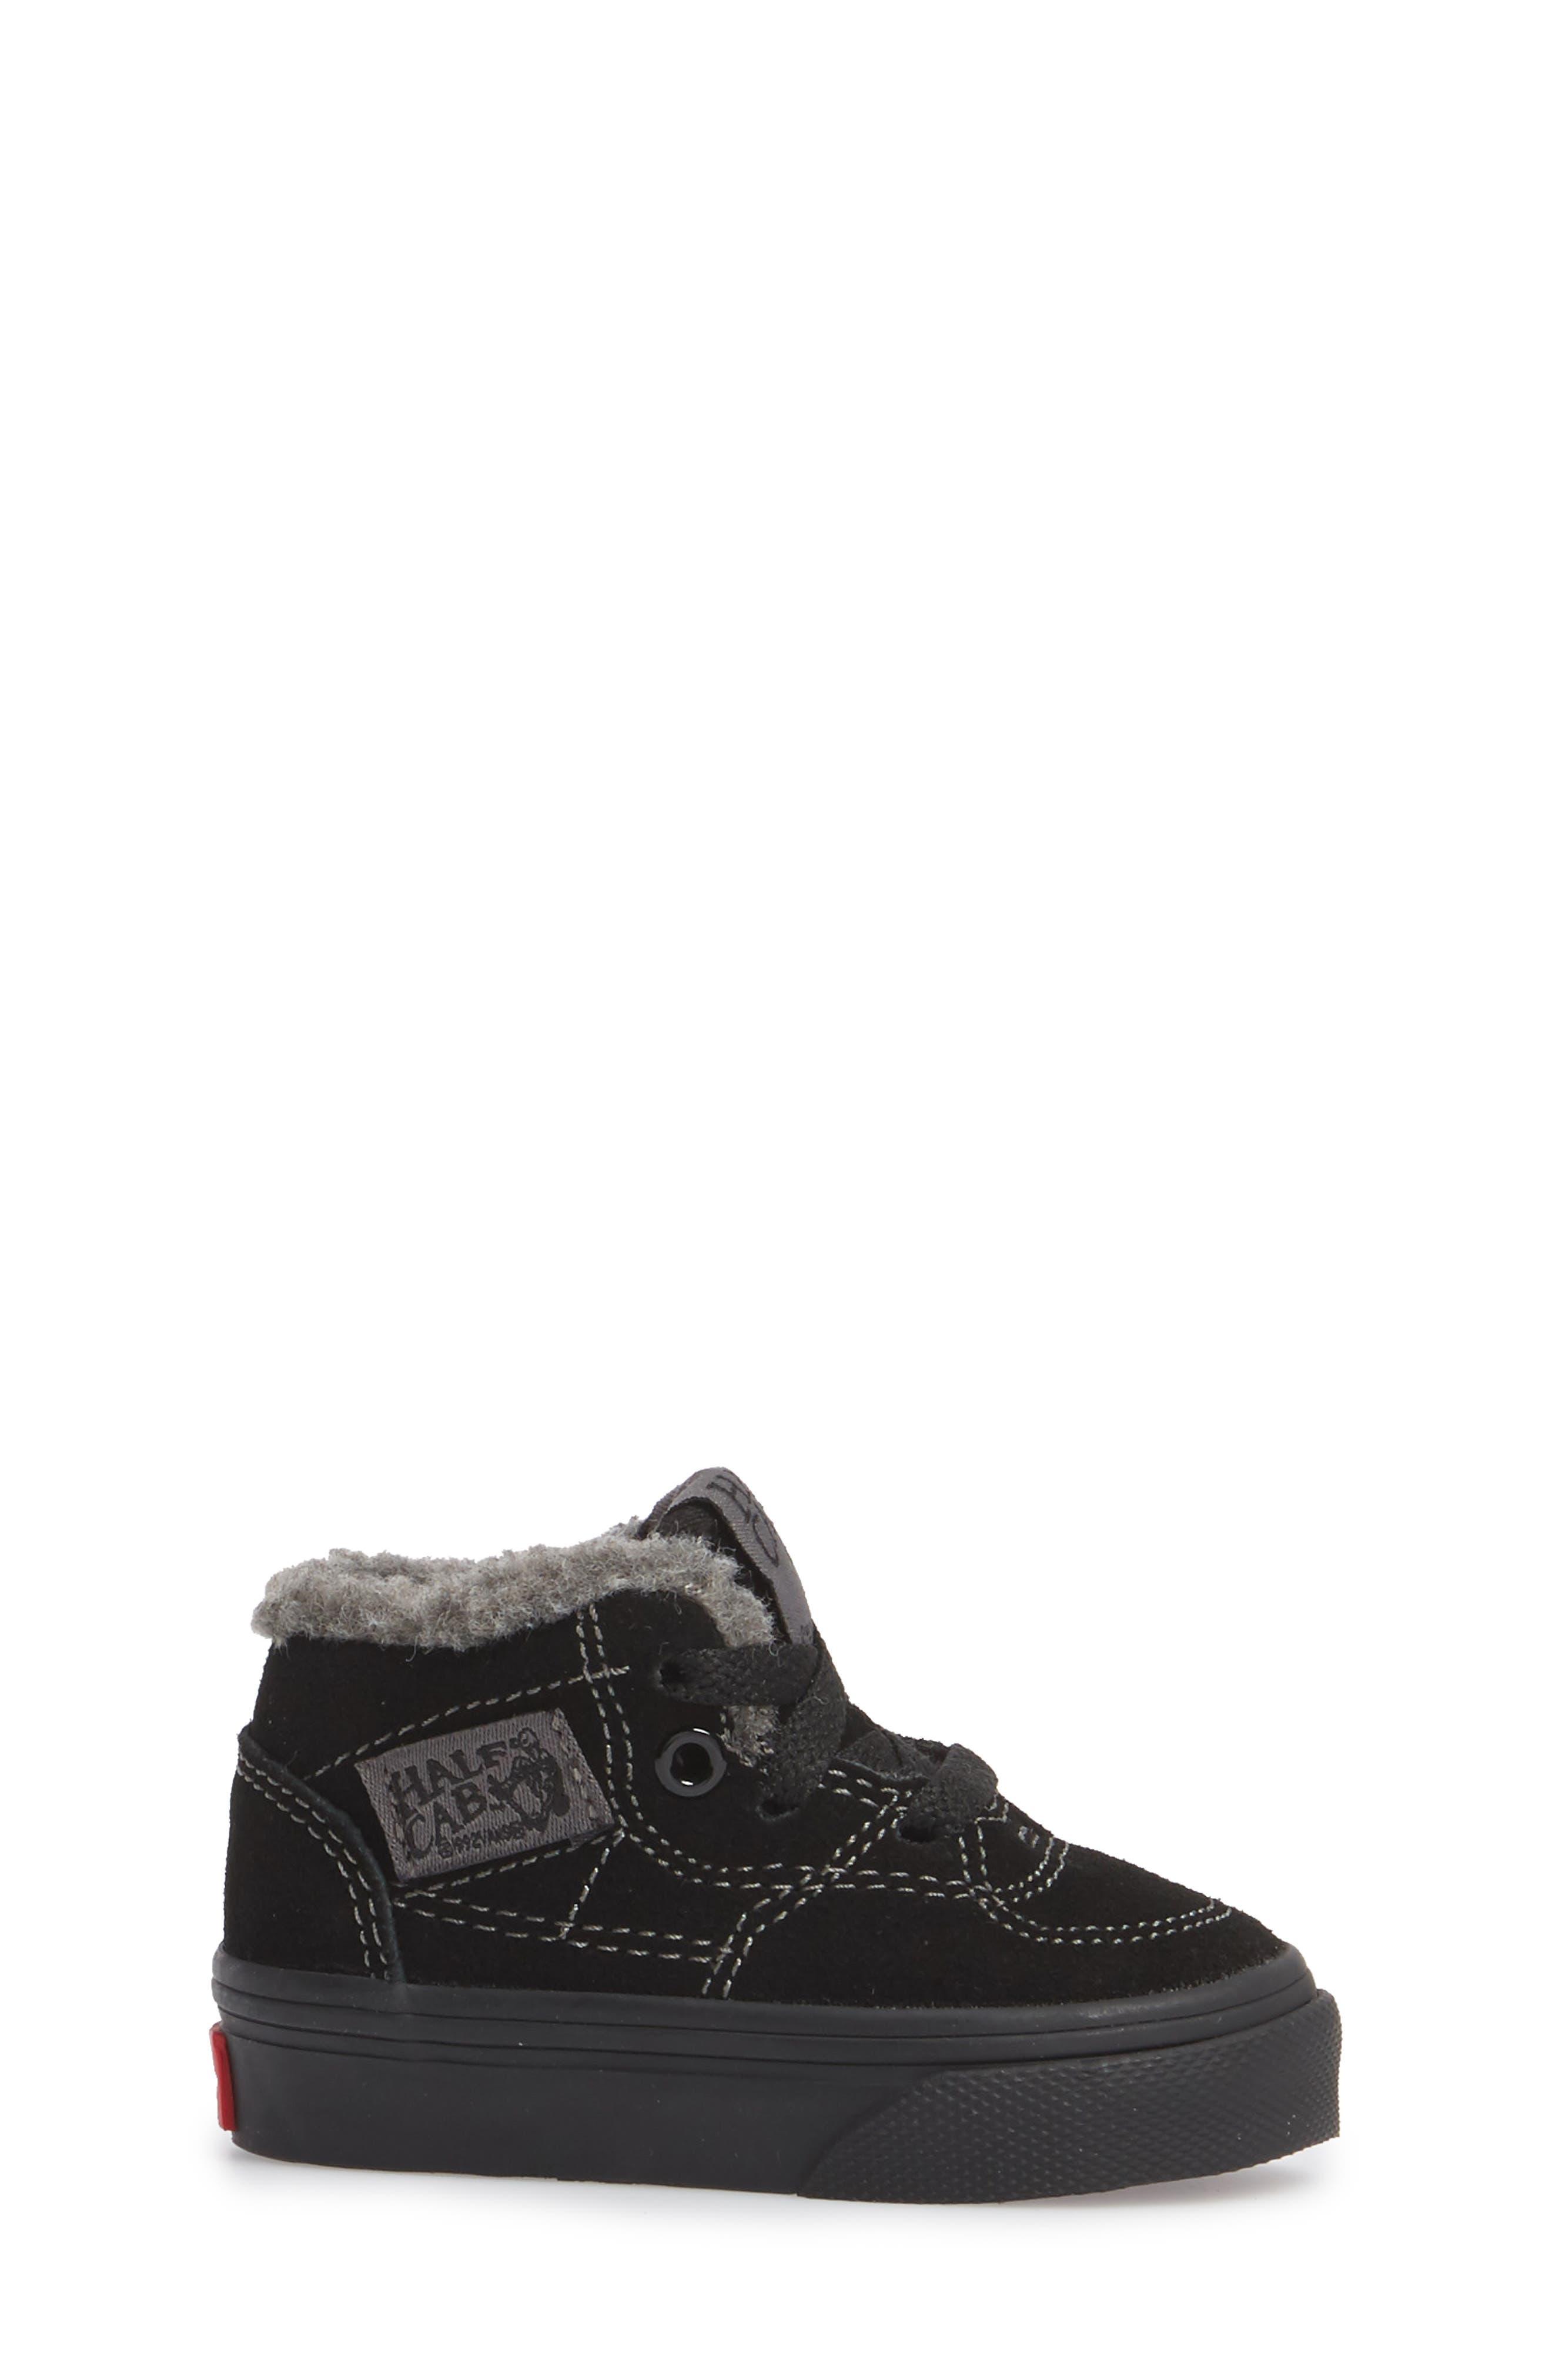 Half Cab Sneaker,                             Alternate thumbnail 3, color,                             001